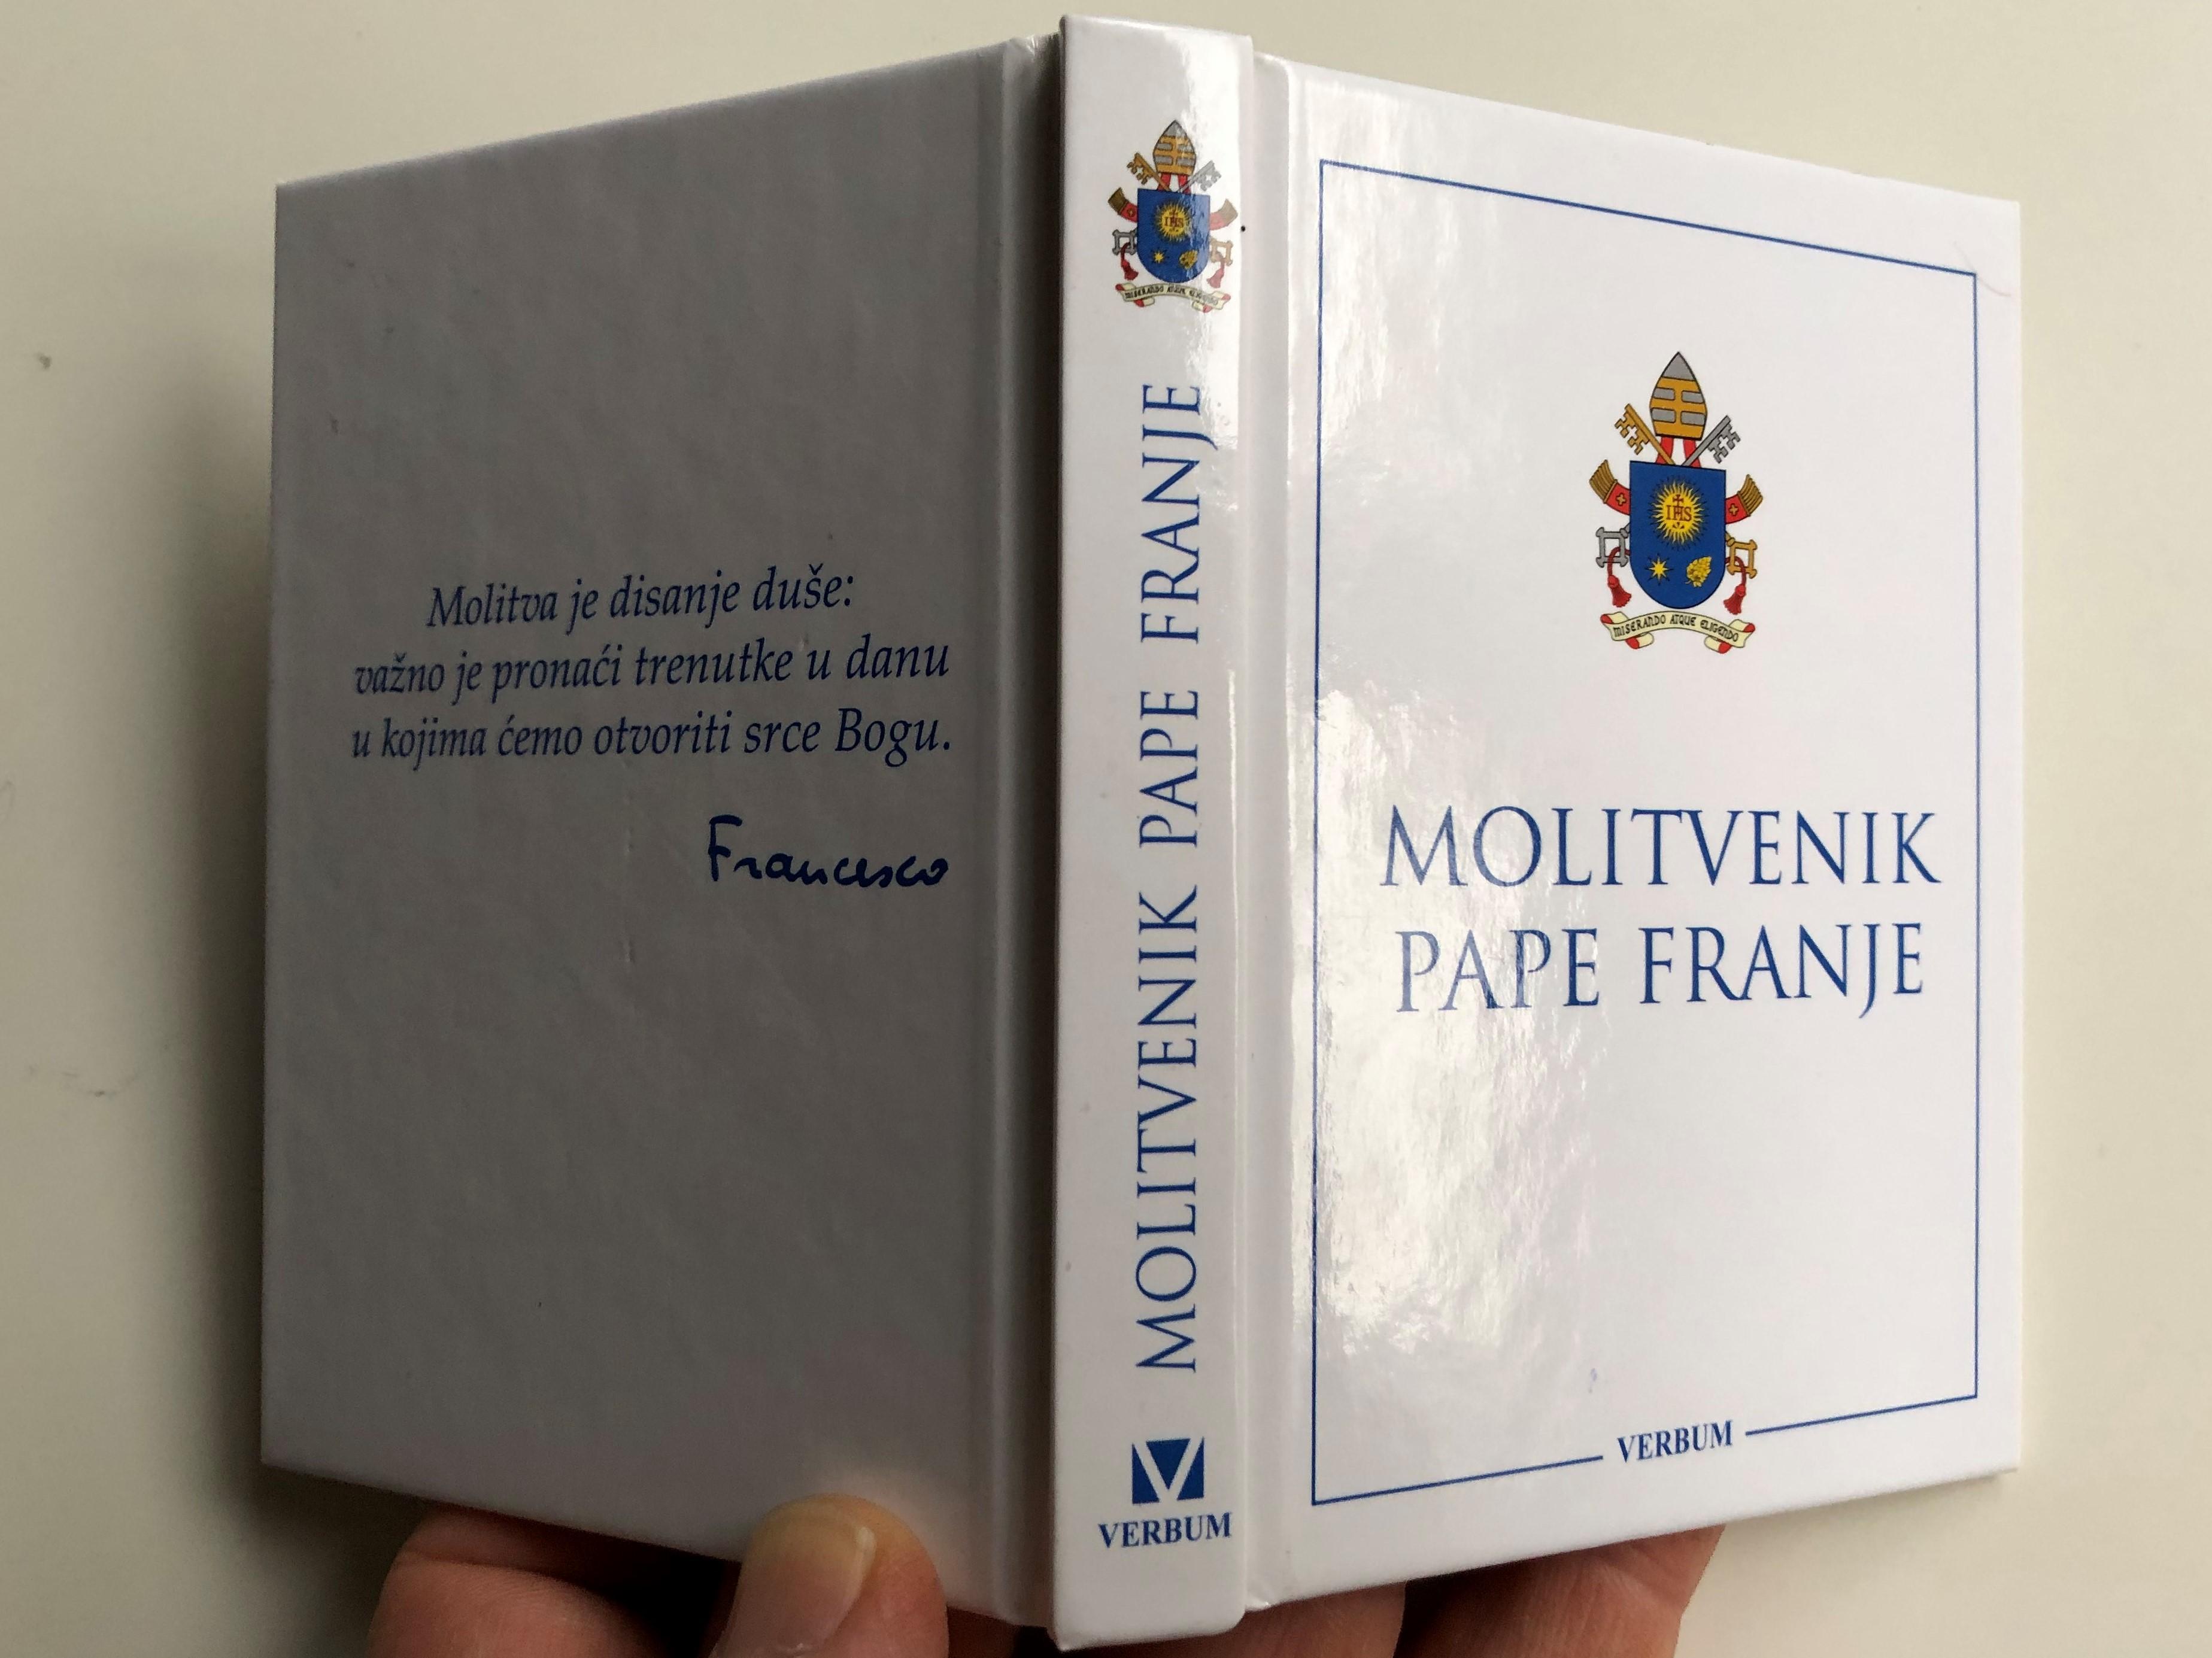 croatian-language-prayer-of-pope-francis-croatian-catholic-prayer-book-small-size-13.jpg